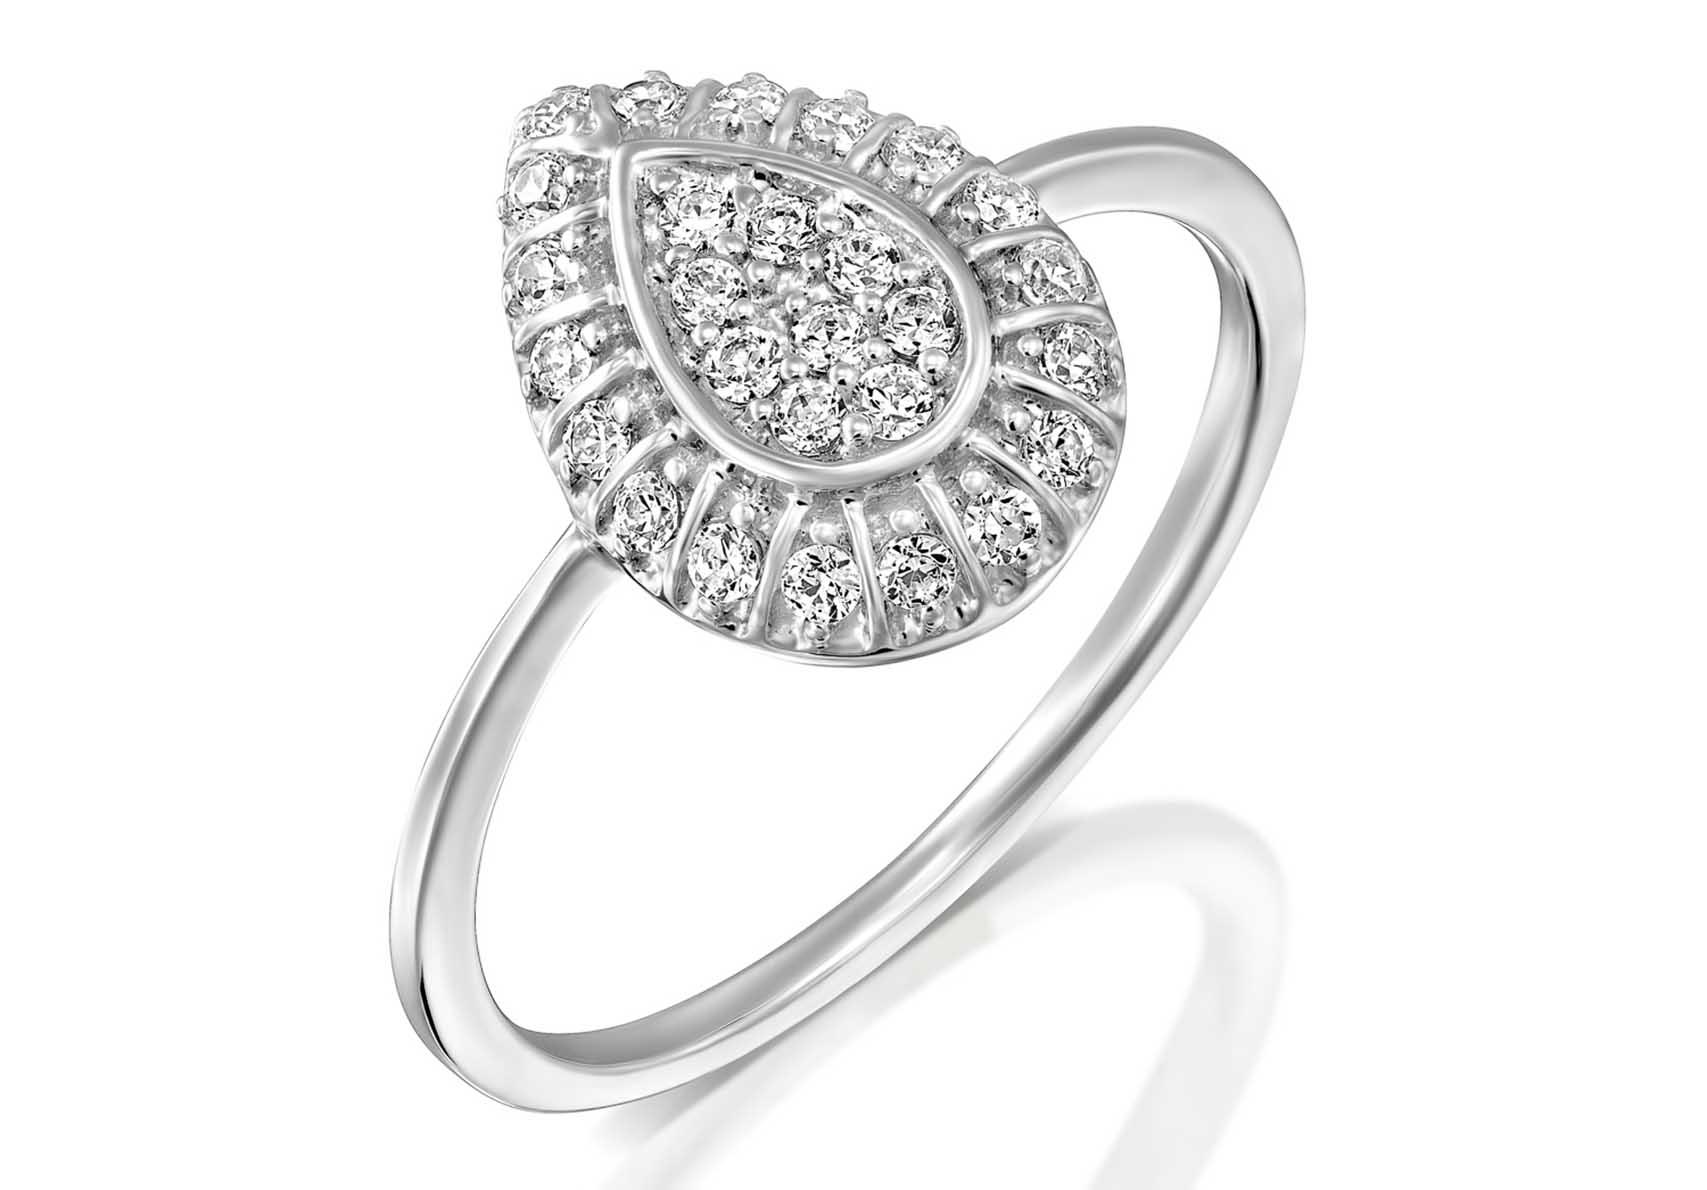 Valentine's Day 2020, טבעת יהלומים של אימפרס, מגזין אופנה